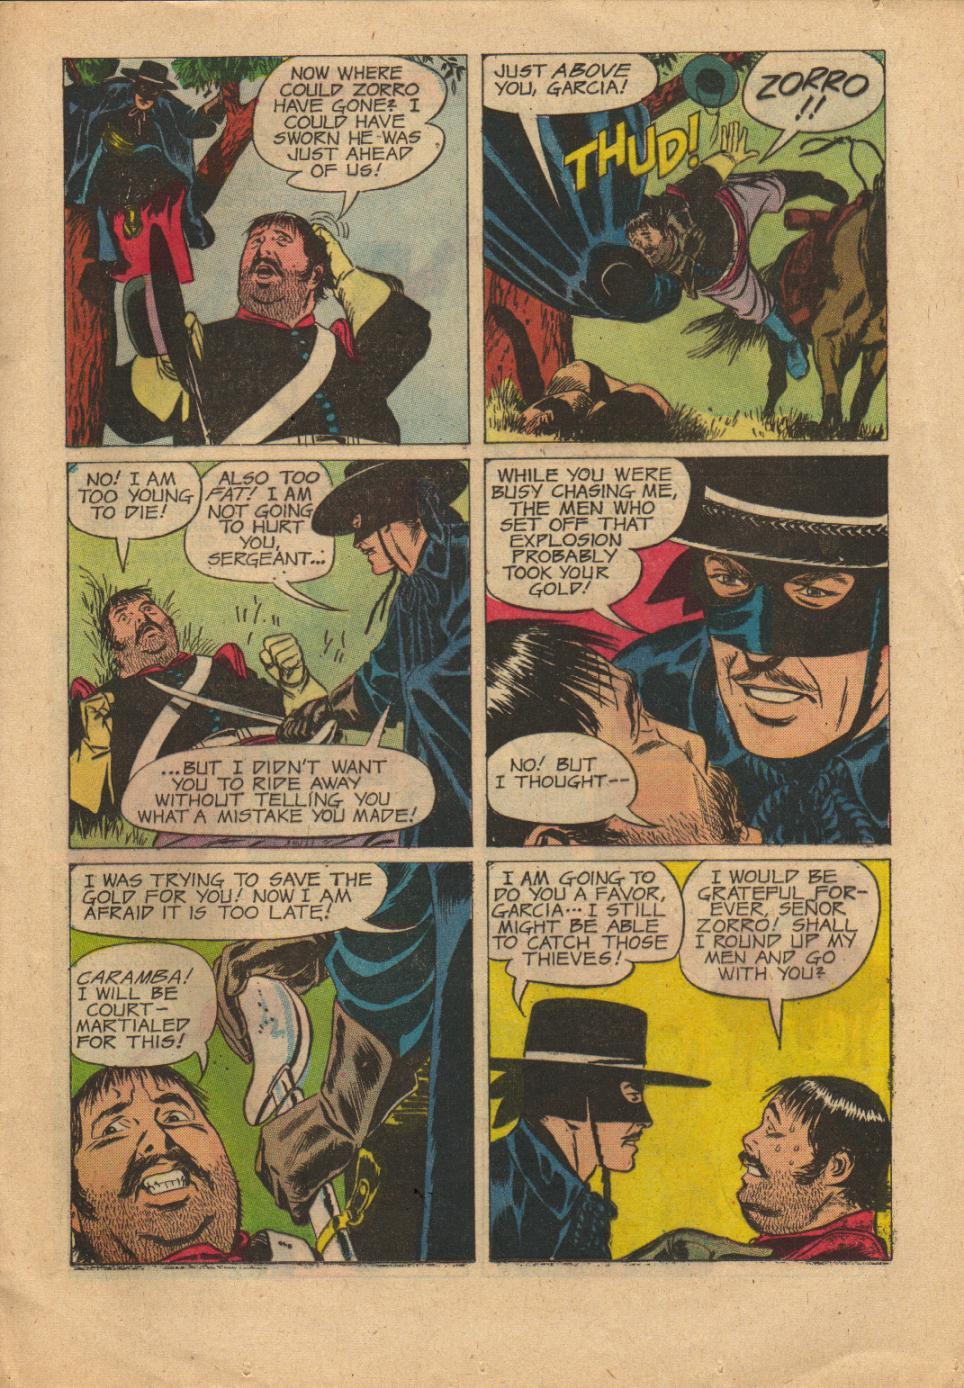 Zorro (1966) Issue #3 Page 13